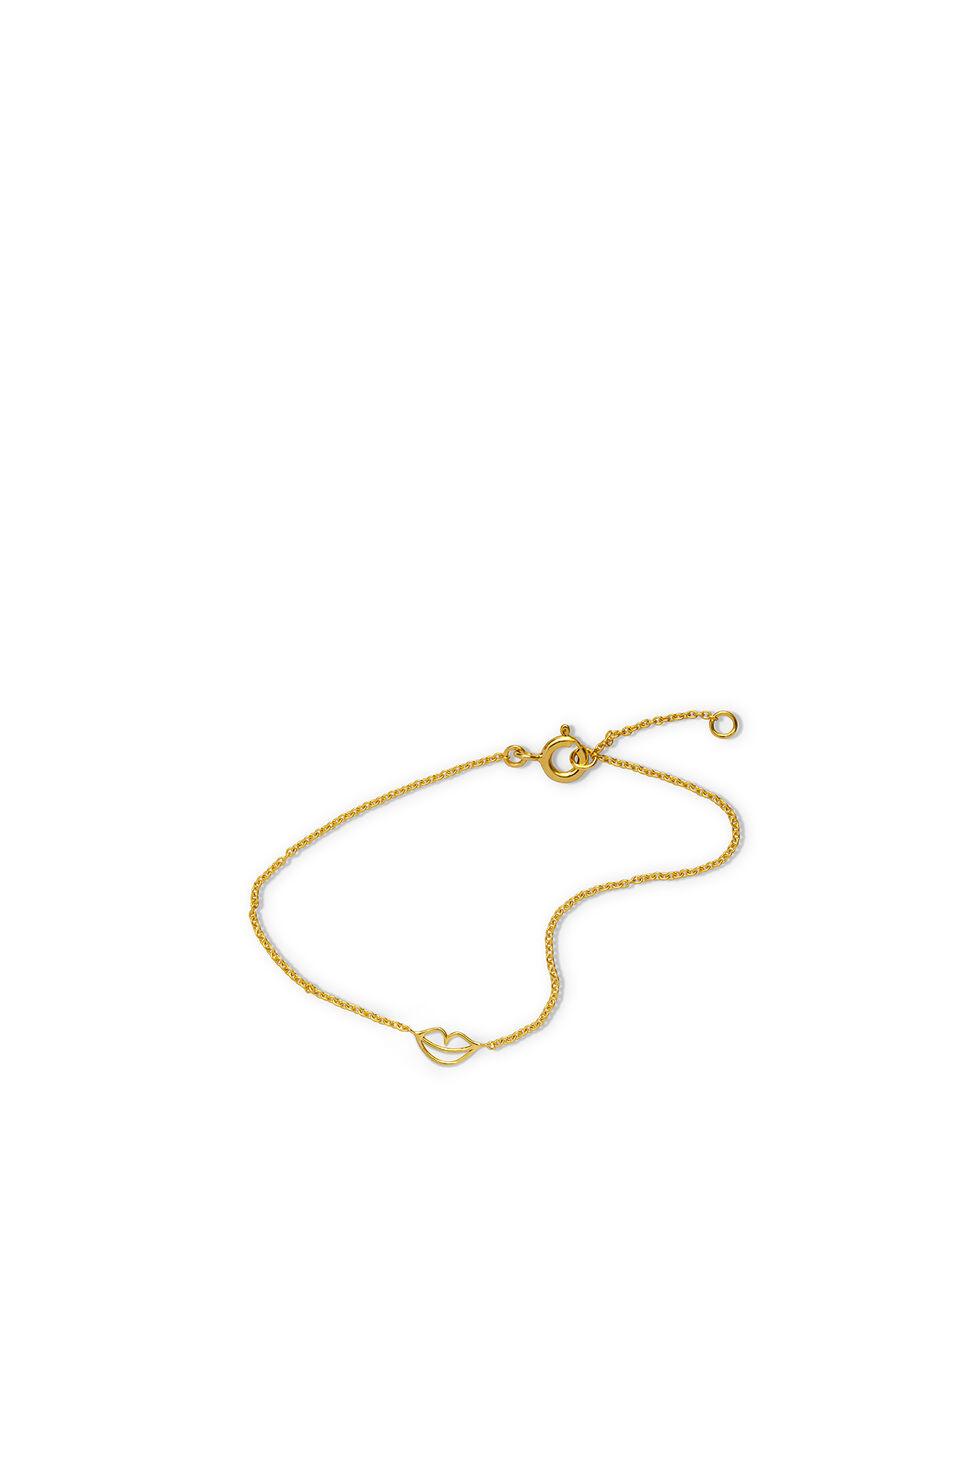 Secret Bracelet LULUB017, GOLD PLATED